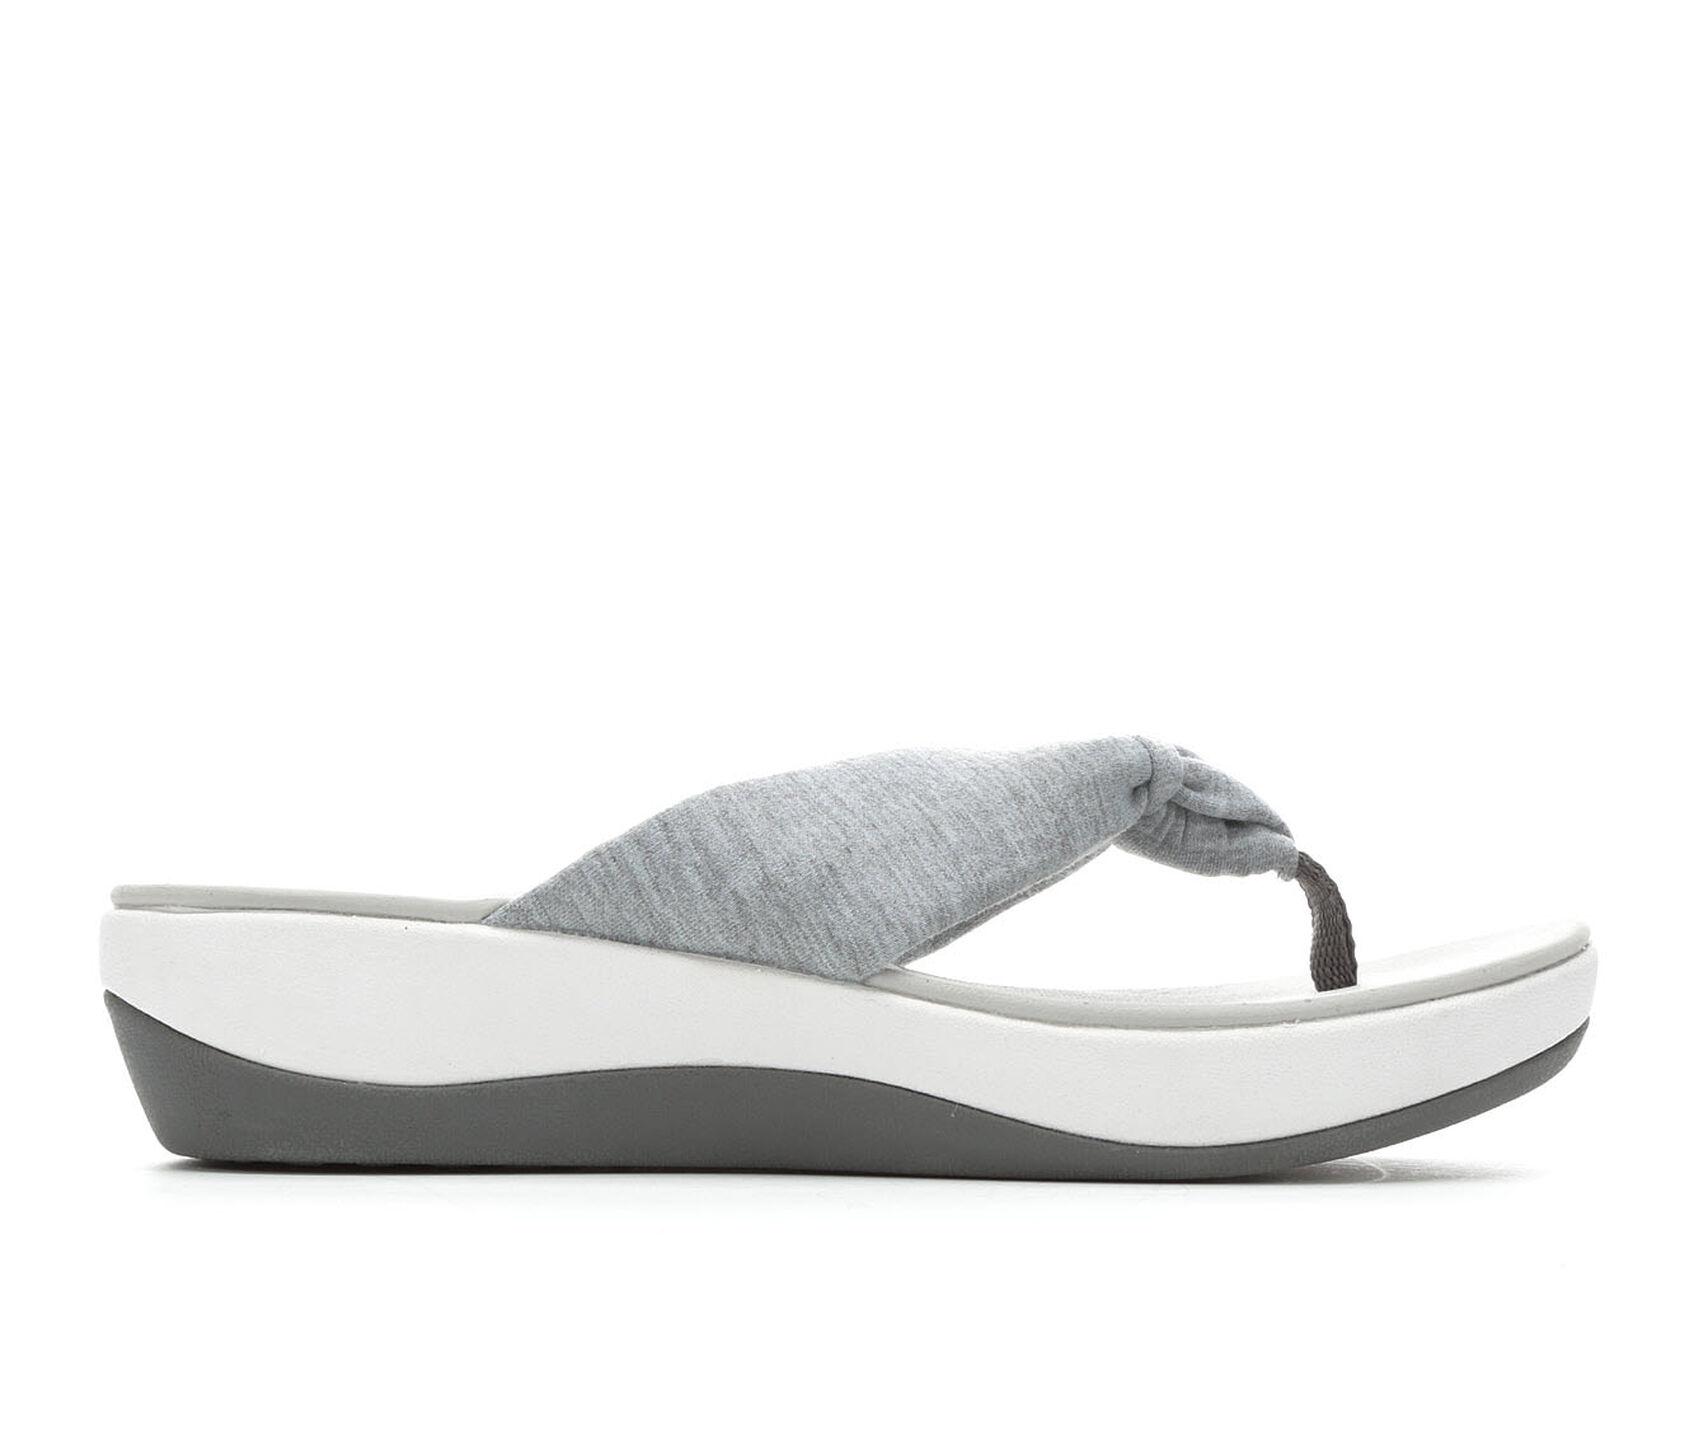 wide selection of colors look good shoes sale pick up Women's Clarks Arla Glison Cloudsteppers Flip-Flops